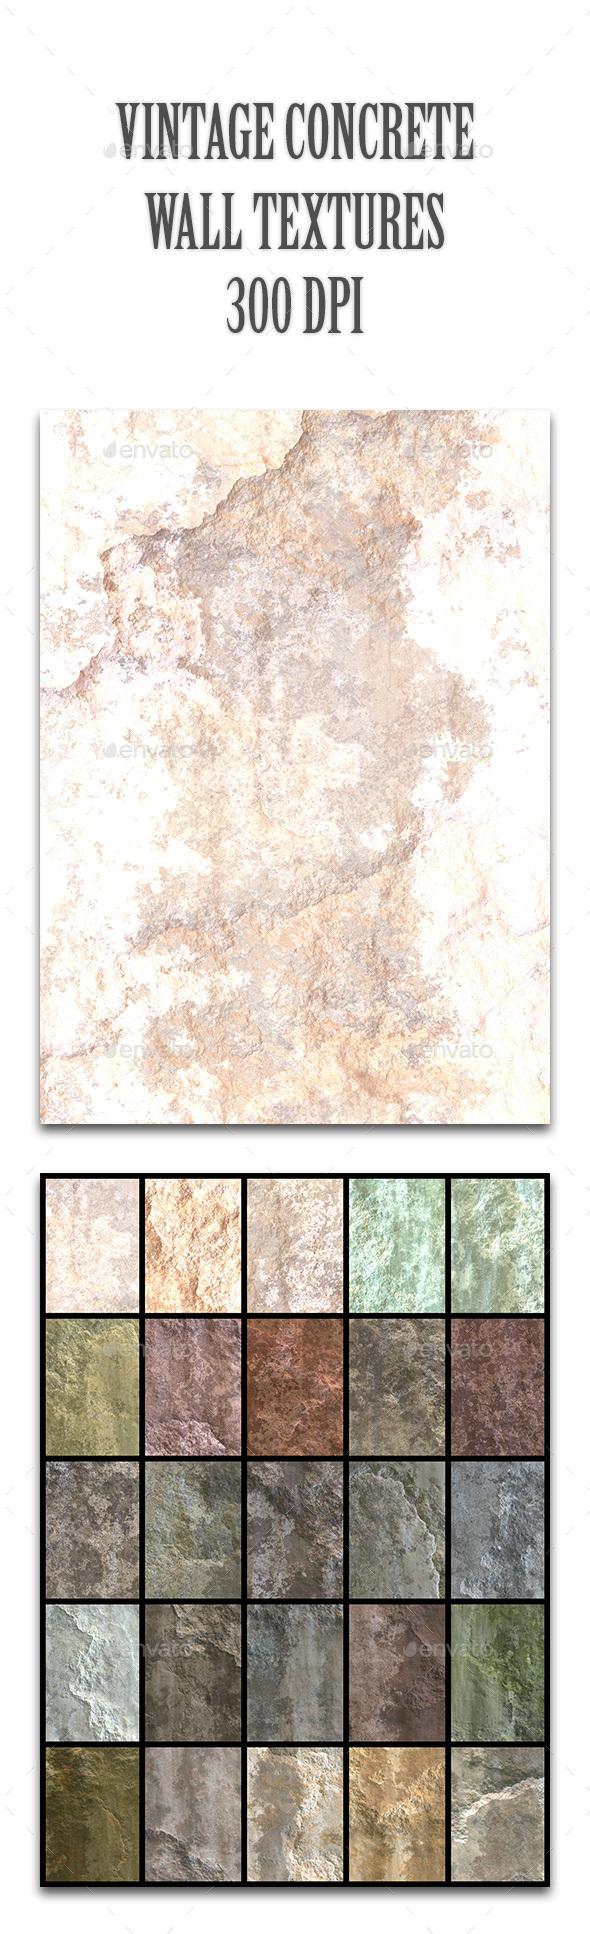 Vintage Concrete Wall Textures - Industrial / Grunge Textures